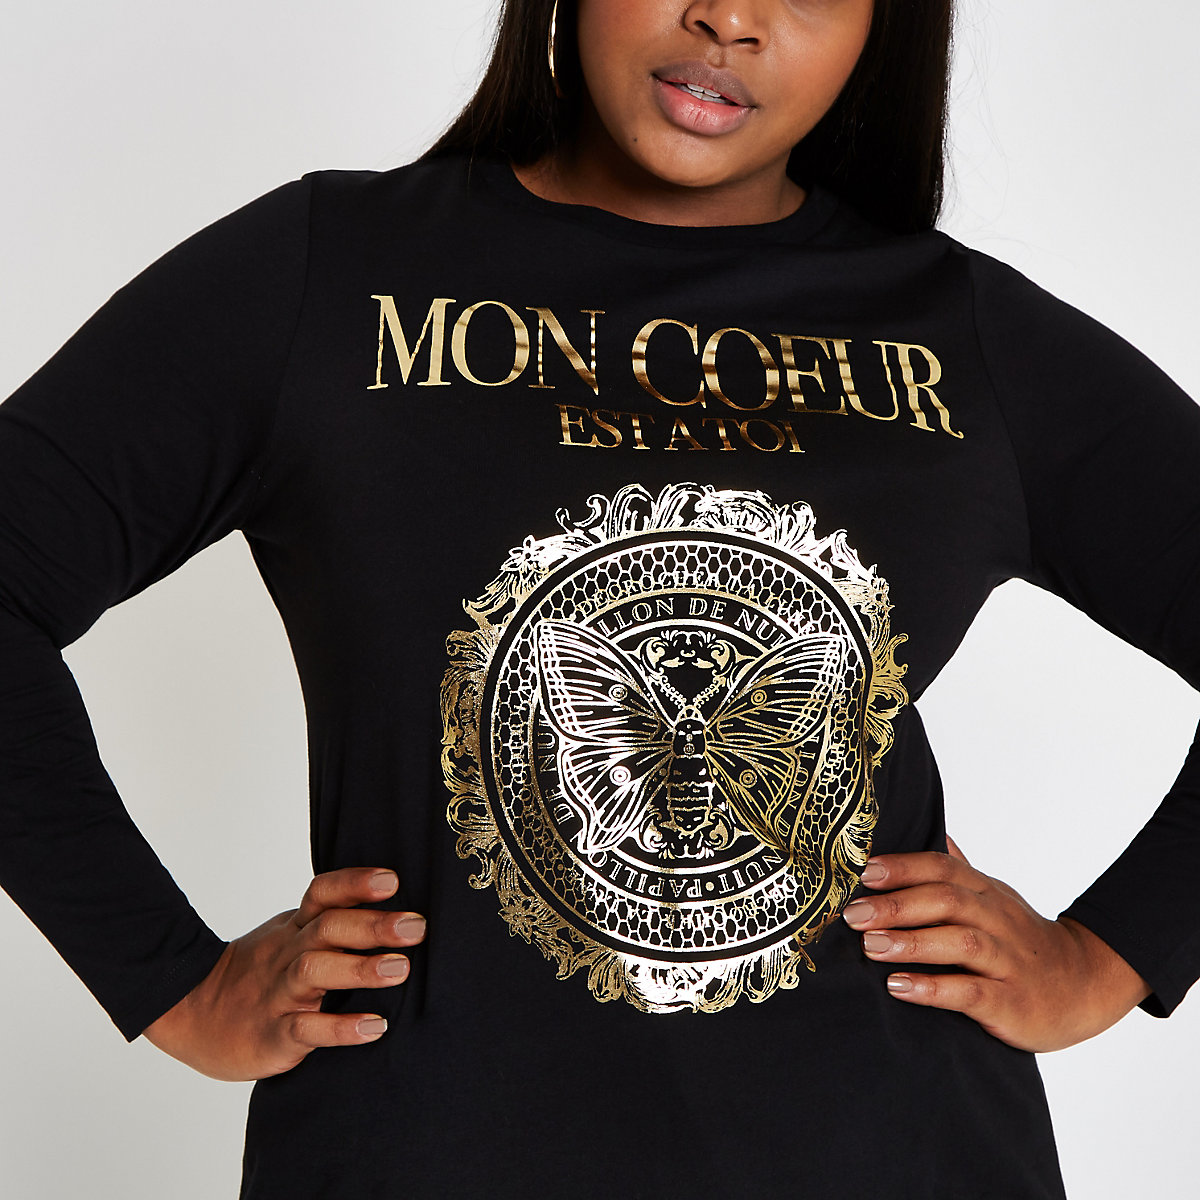 Plus black 'Mon coeur' long sleeve T-shirt